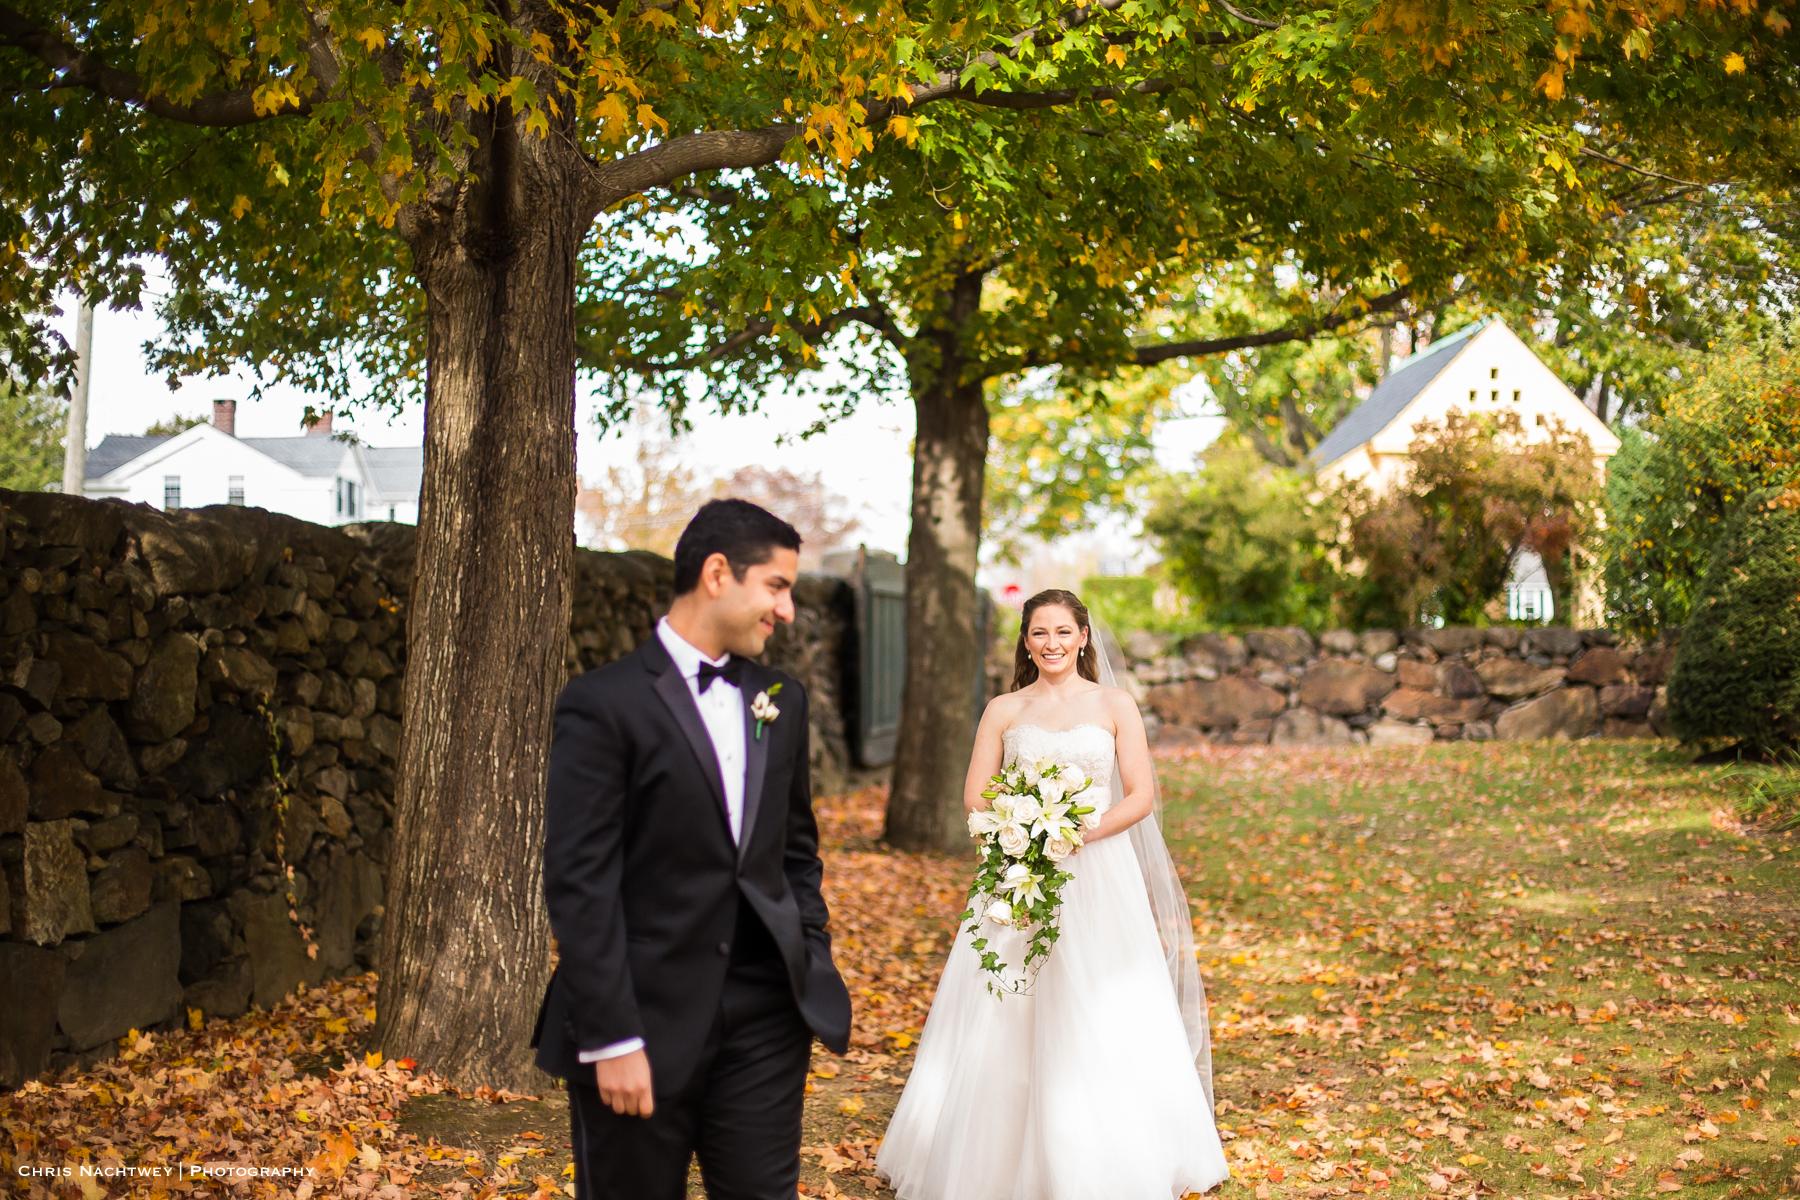 wedding-the-litchfield-inn-ct-photos-chris-nachtwey-photography-2018-18.jpg